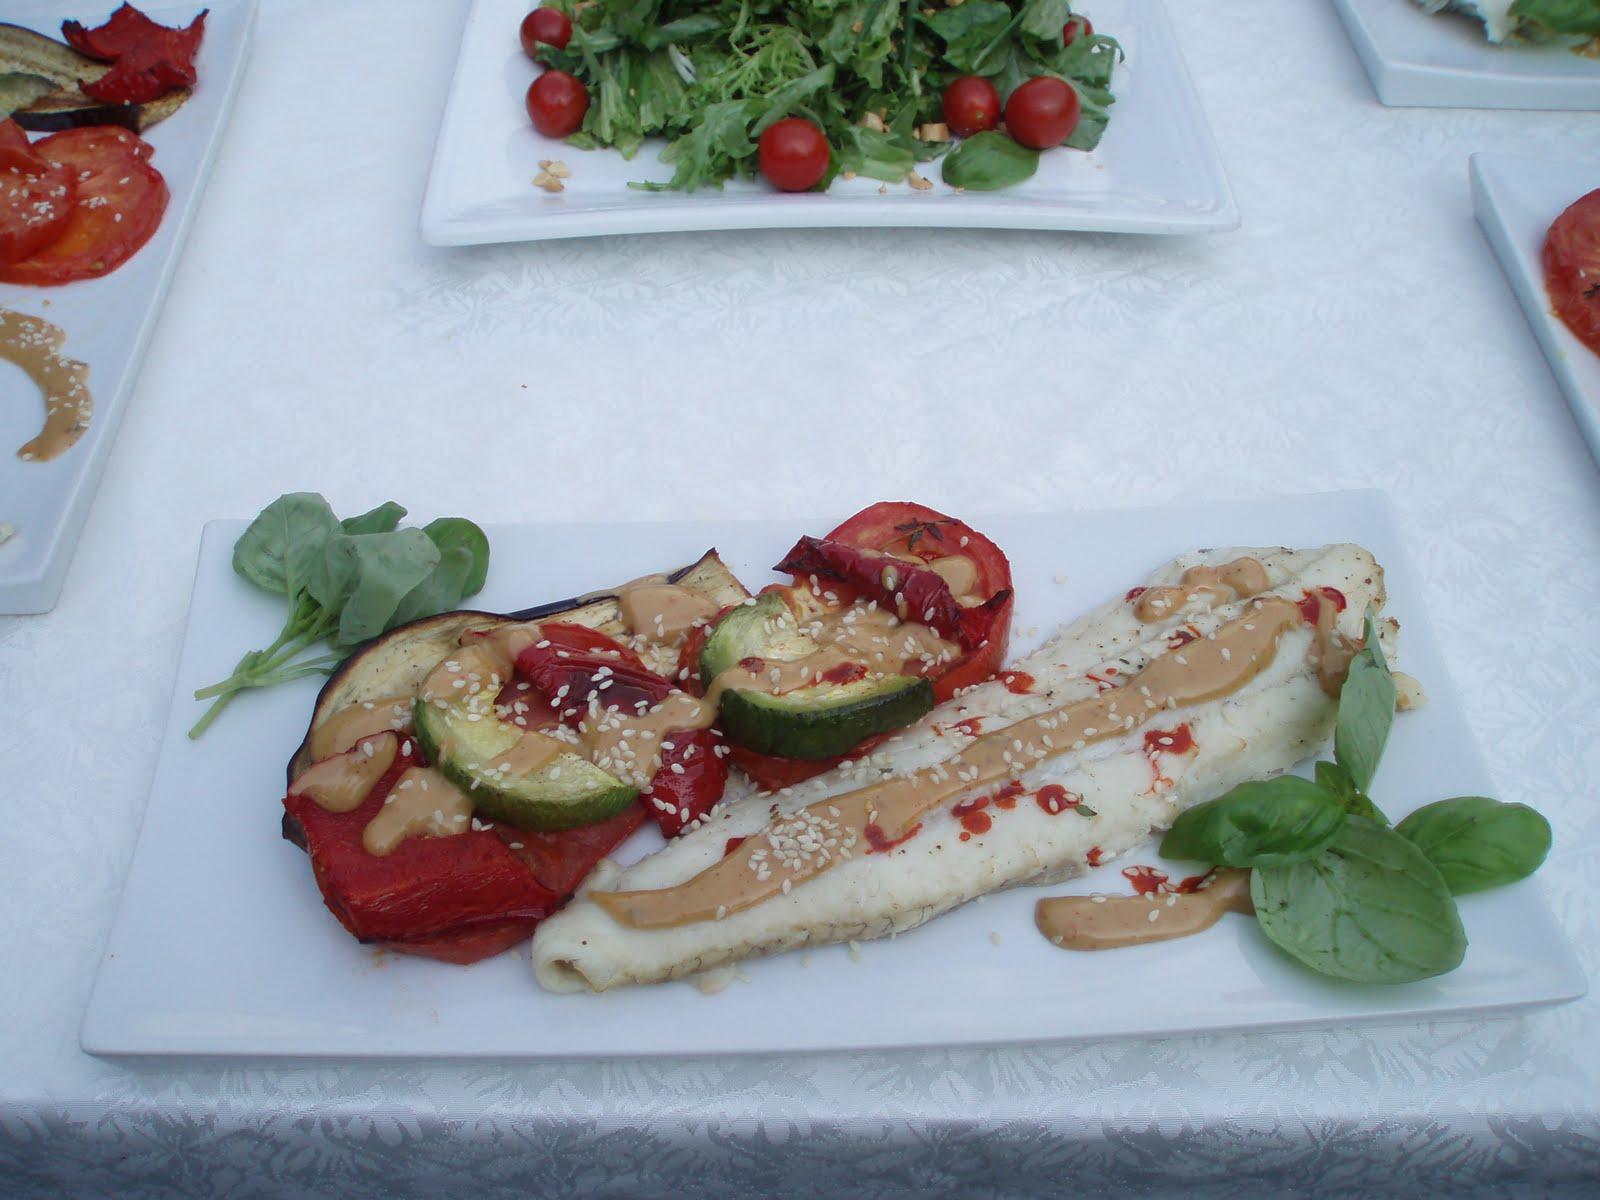 Gastronom a curso de cocina b sica saludable for Curso de cocina basica pdf